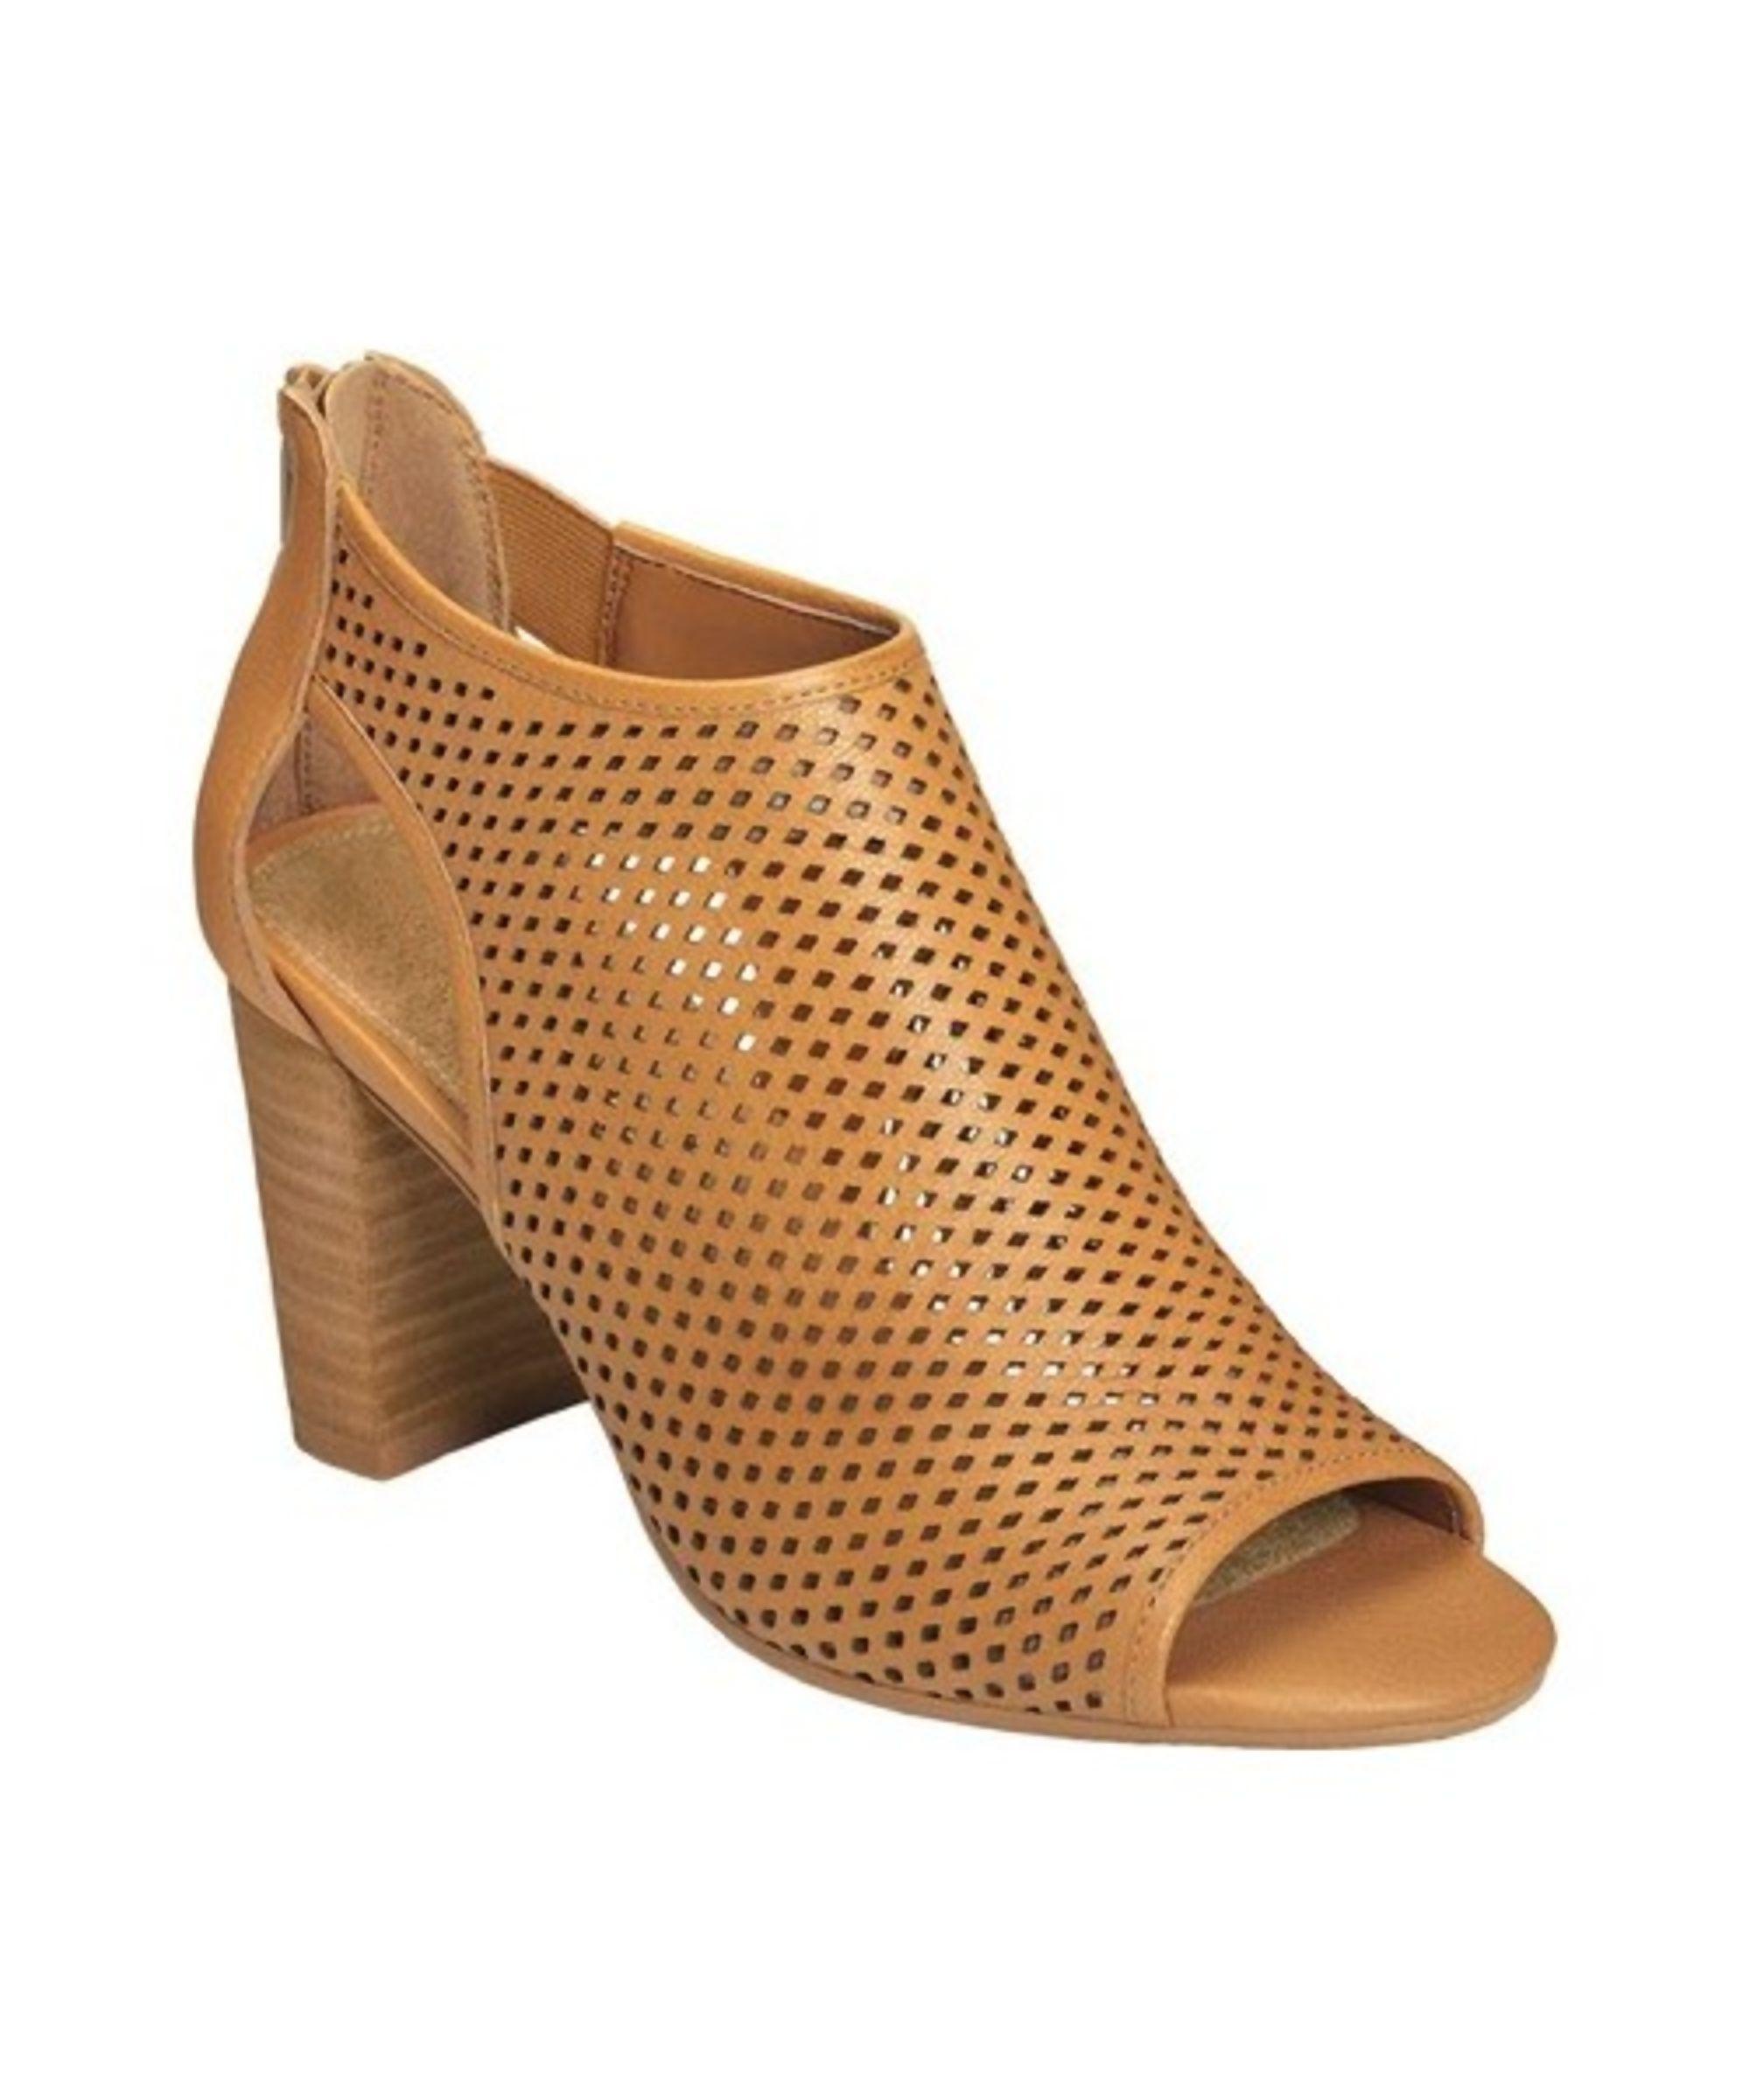 Aerosoles High Frequency Open Toe Bootie(Women's) -Dark Tan Leather Store Sale PKykyDrA